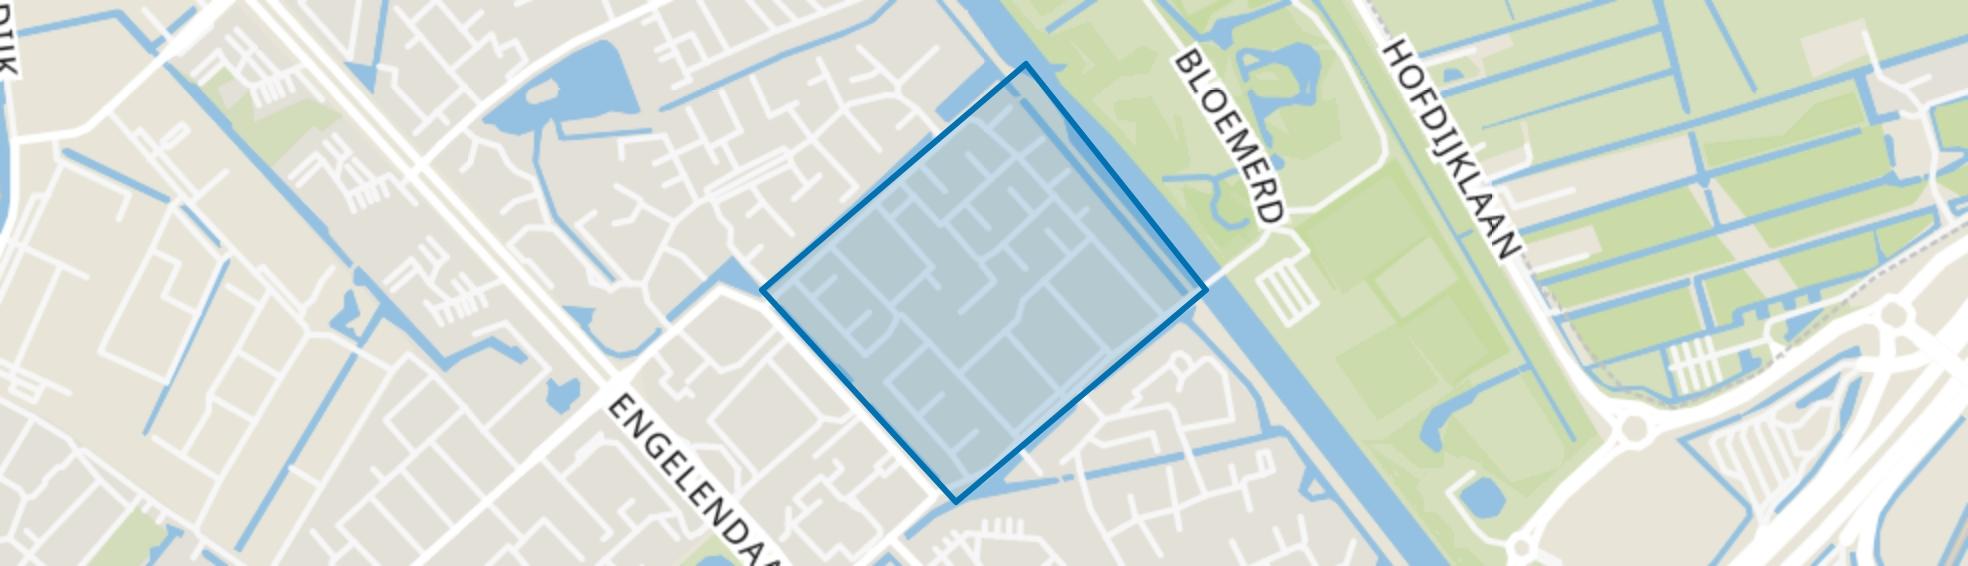 Binnenhof, Leiderdorp map